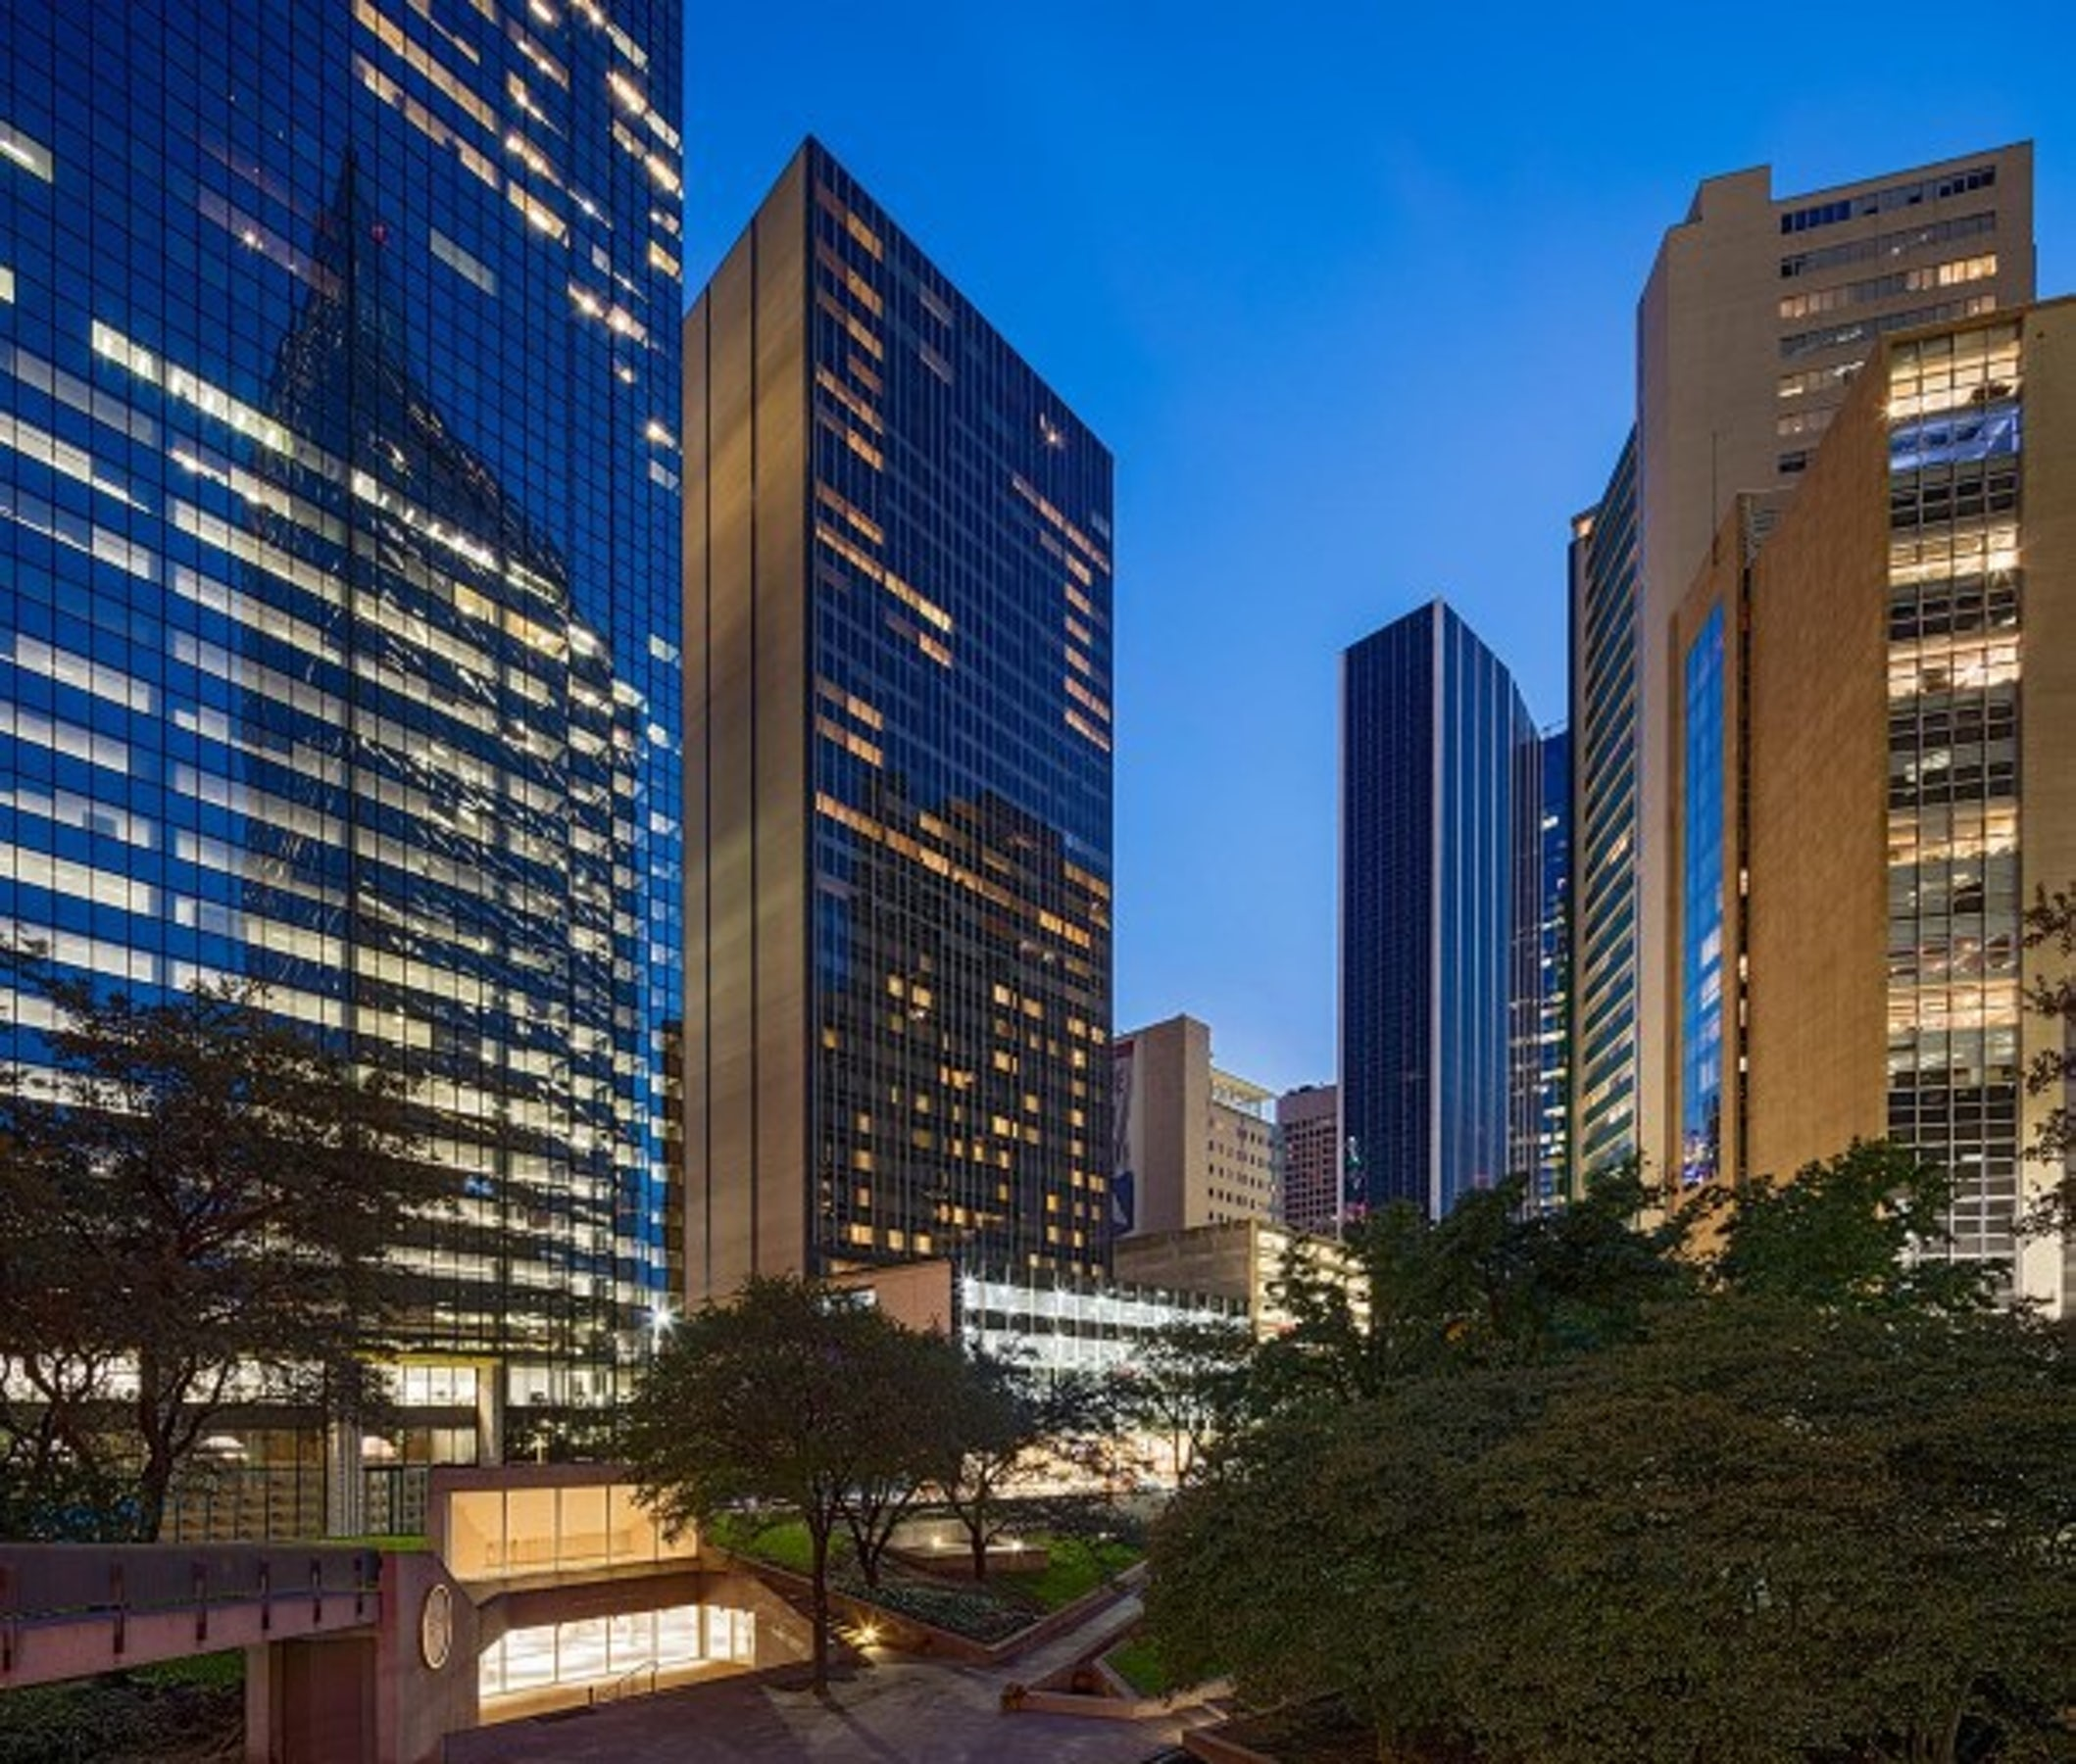 Hilton Garden Inn Downtown Dallas in Beyond Dallas